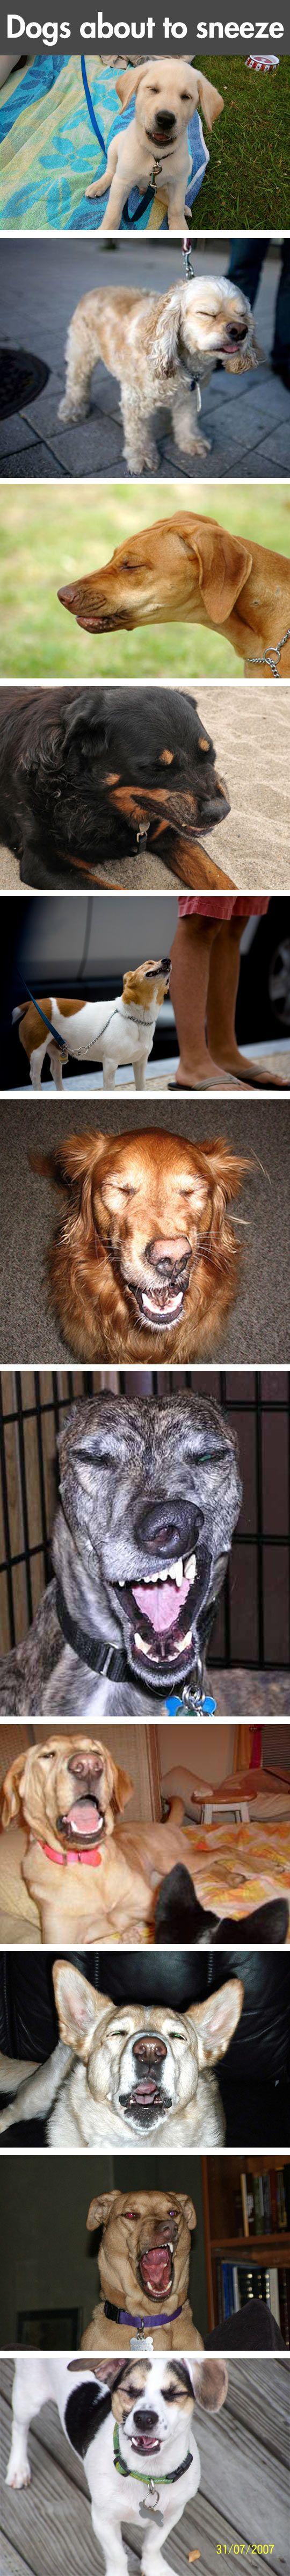 Dogs sneeze - 3